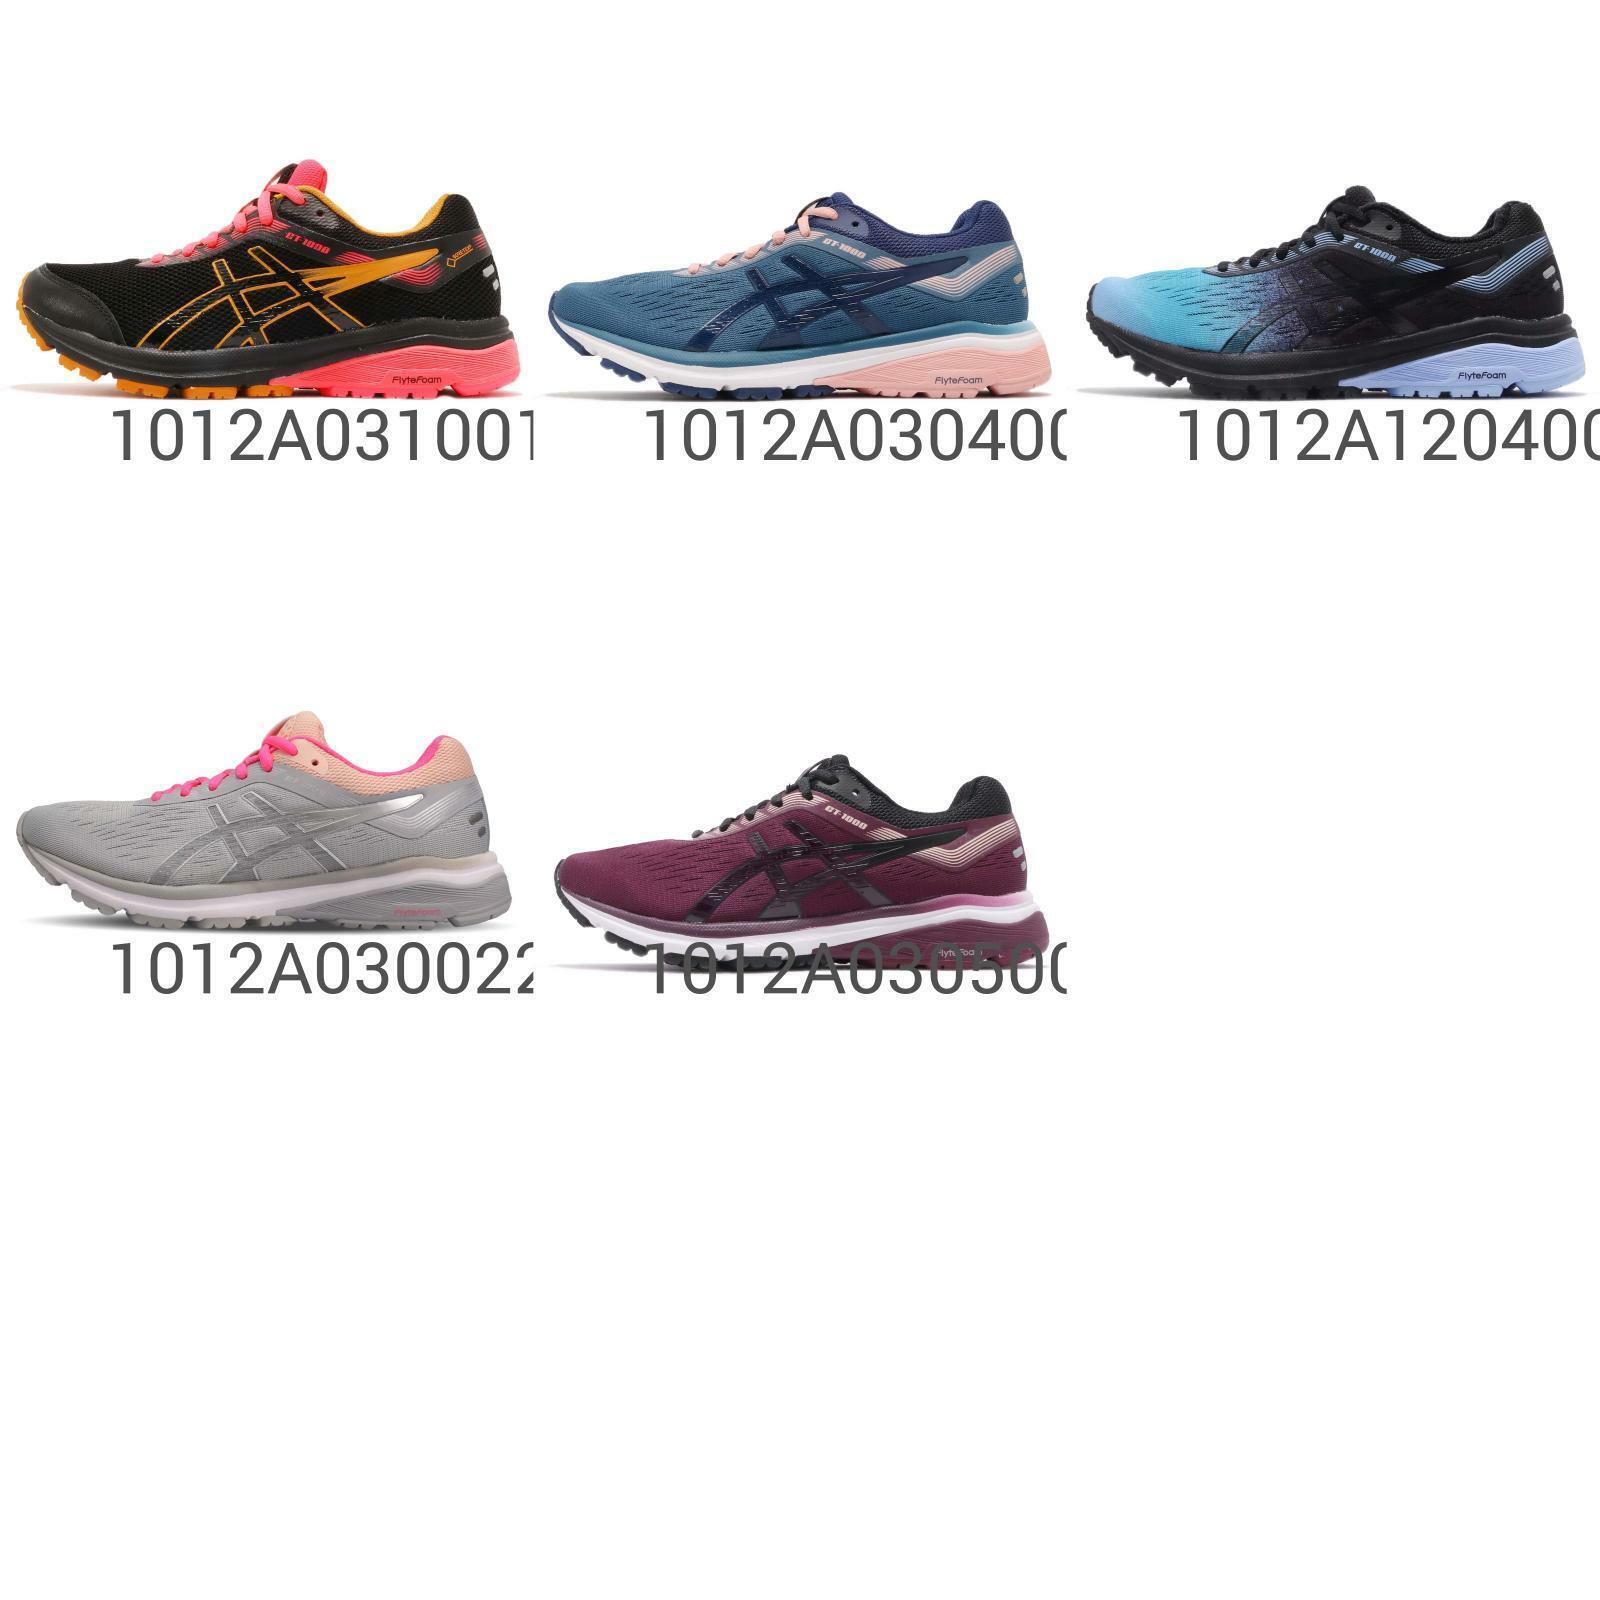 Asics GT-1000 7 VII   Gore-Tex Gel FlyteFoam Womens Running shoes Sneaker Pick 1